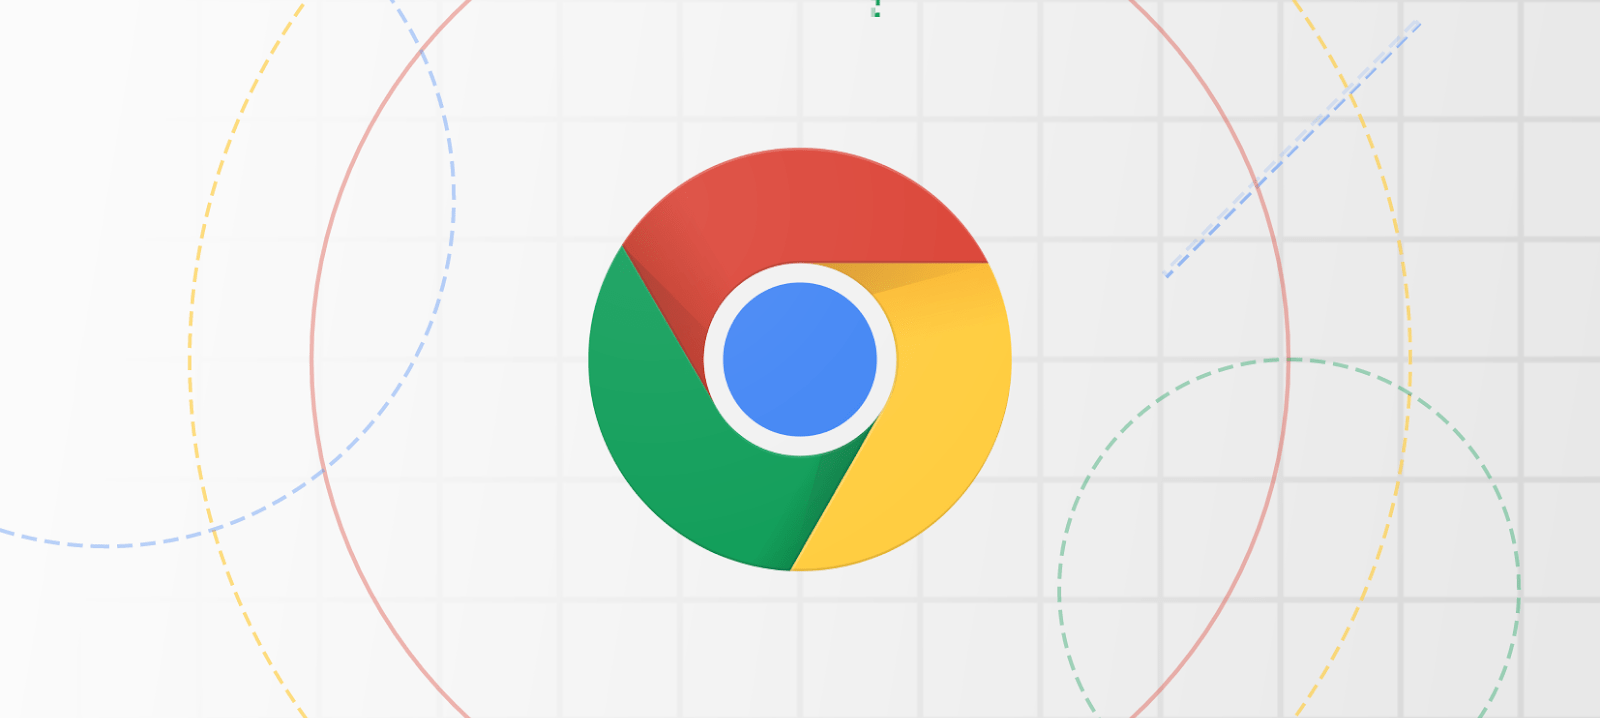 chrome 1 - Chrome 87 ενεργοποιήστε το κρυμμένο PDF reader